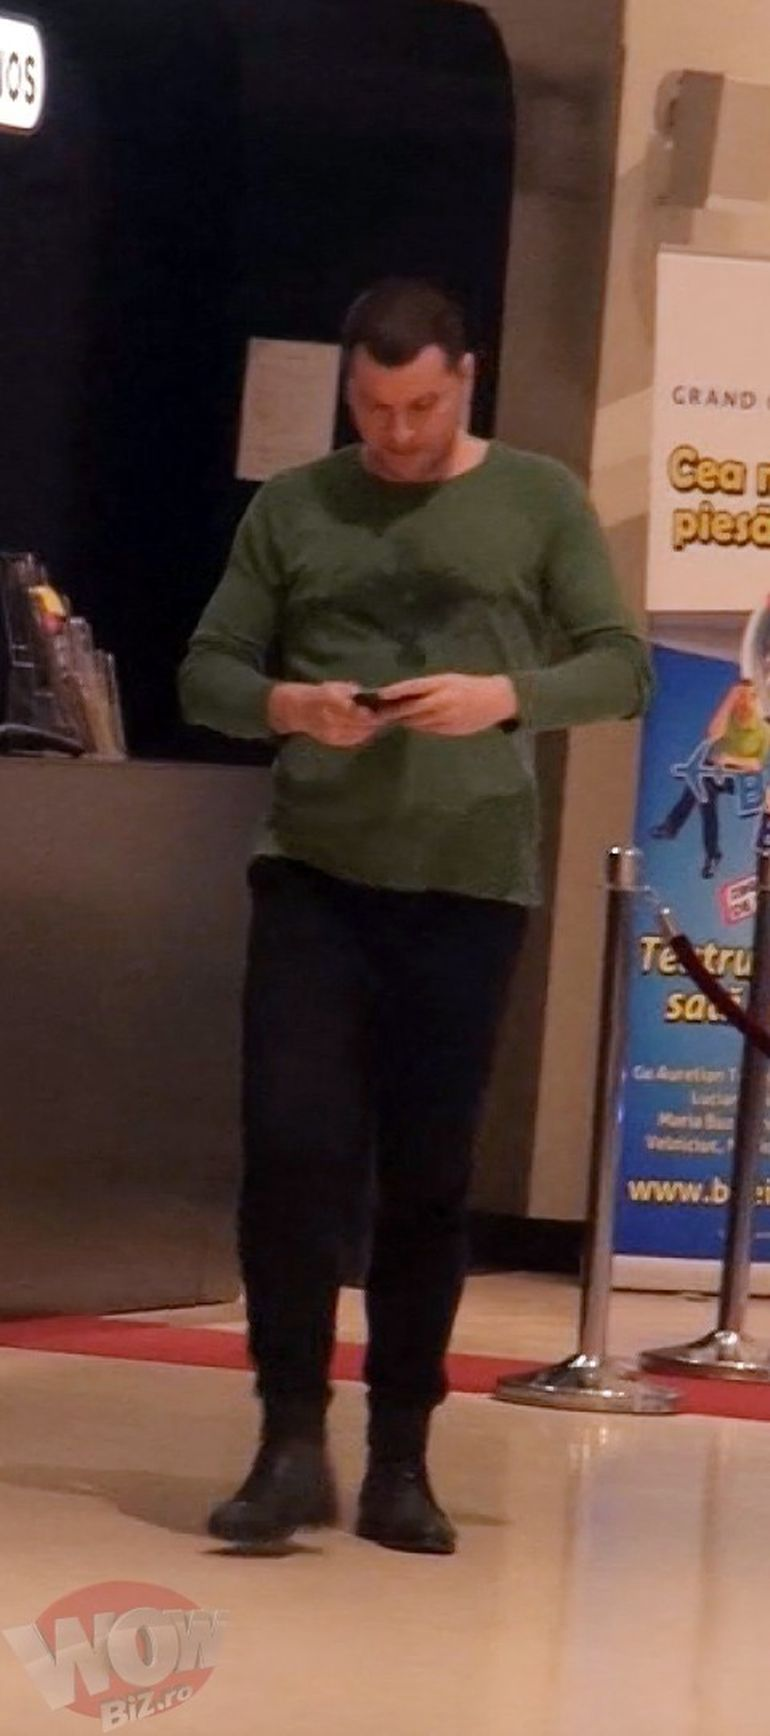 VIDEO EXCLUSIV! Daca nu Fizz, atunci cine?! Afaceristul cu blana s-a giugiulit tandru cu o bruneta periculoasa si a dus-o la cinema. Bineinteles, la VIP…